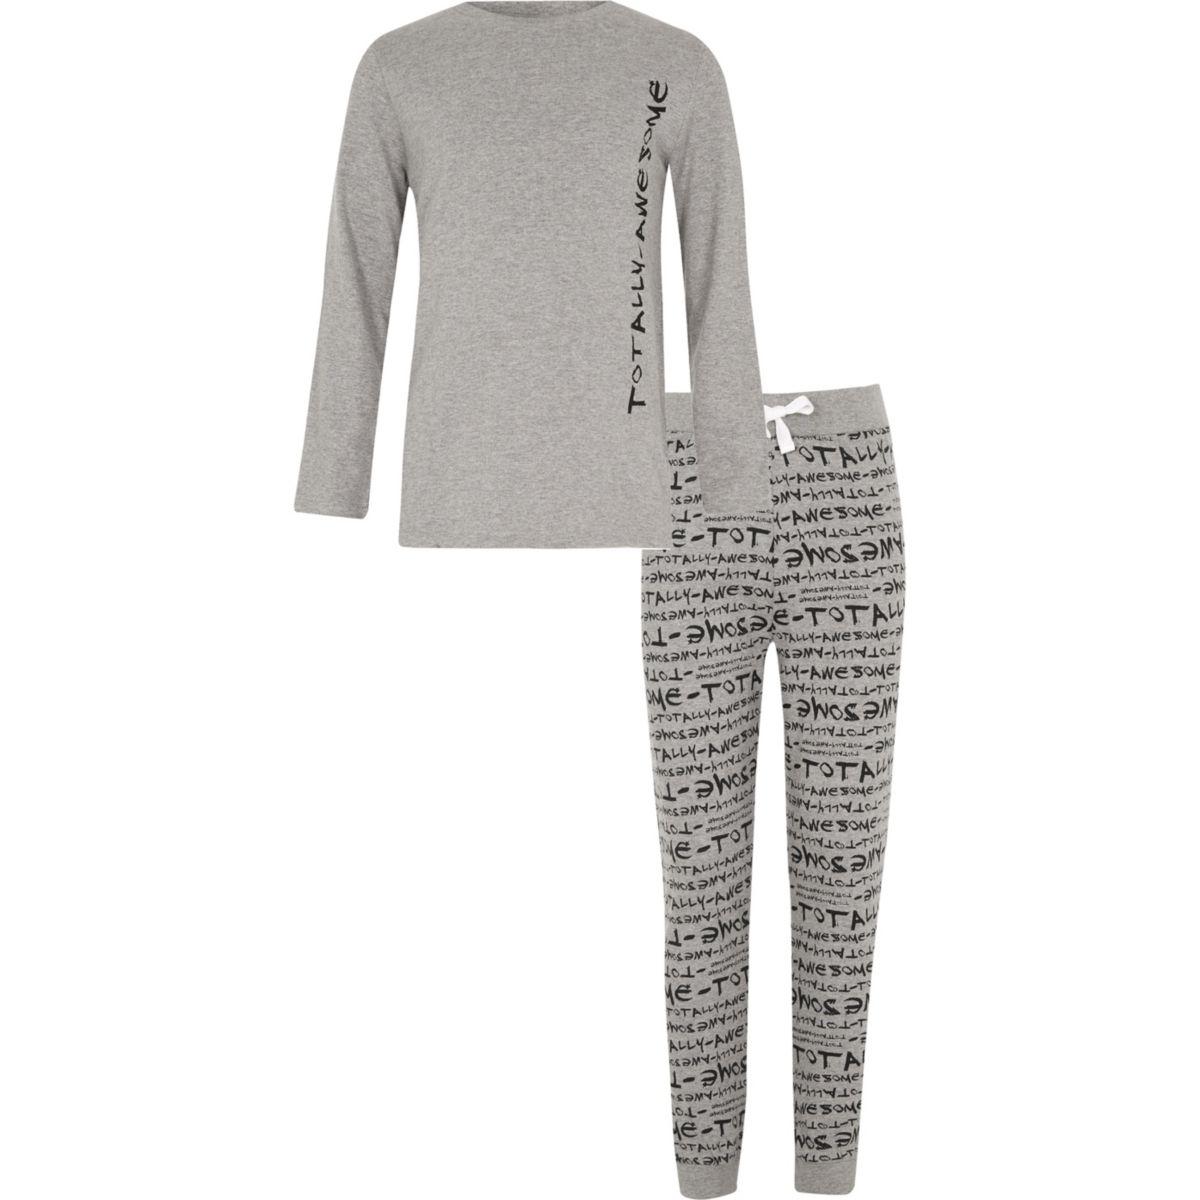 Boys grey 'totally awesome' print pyjama set